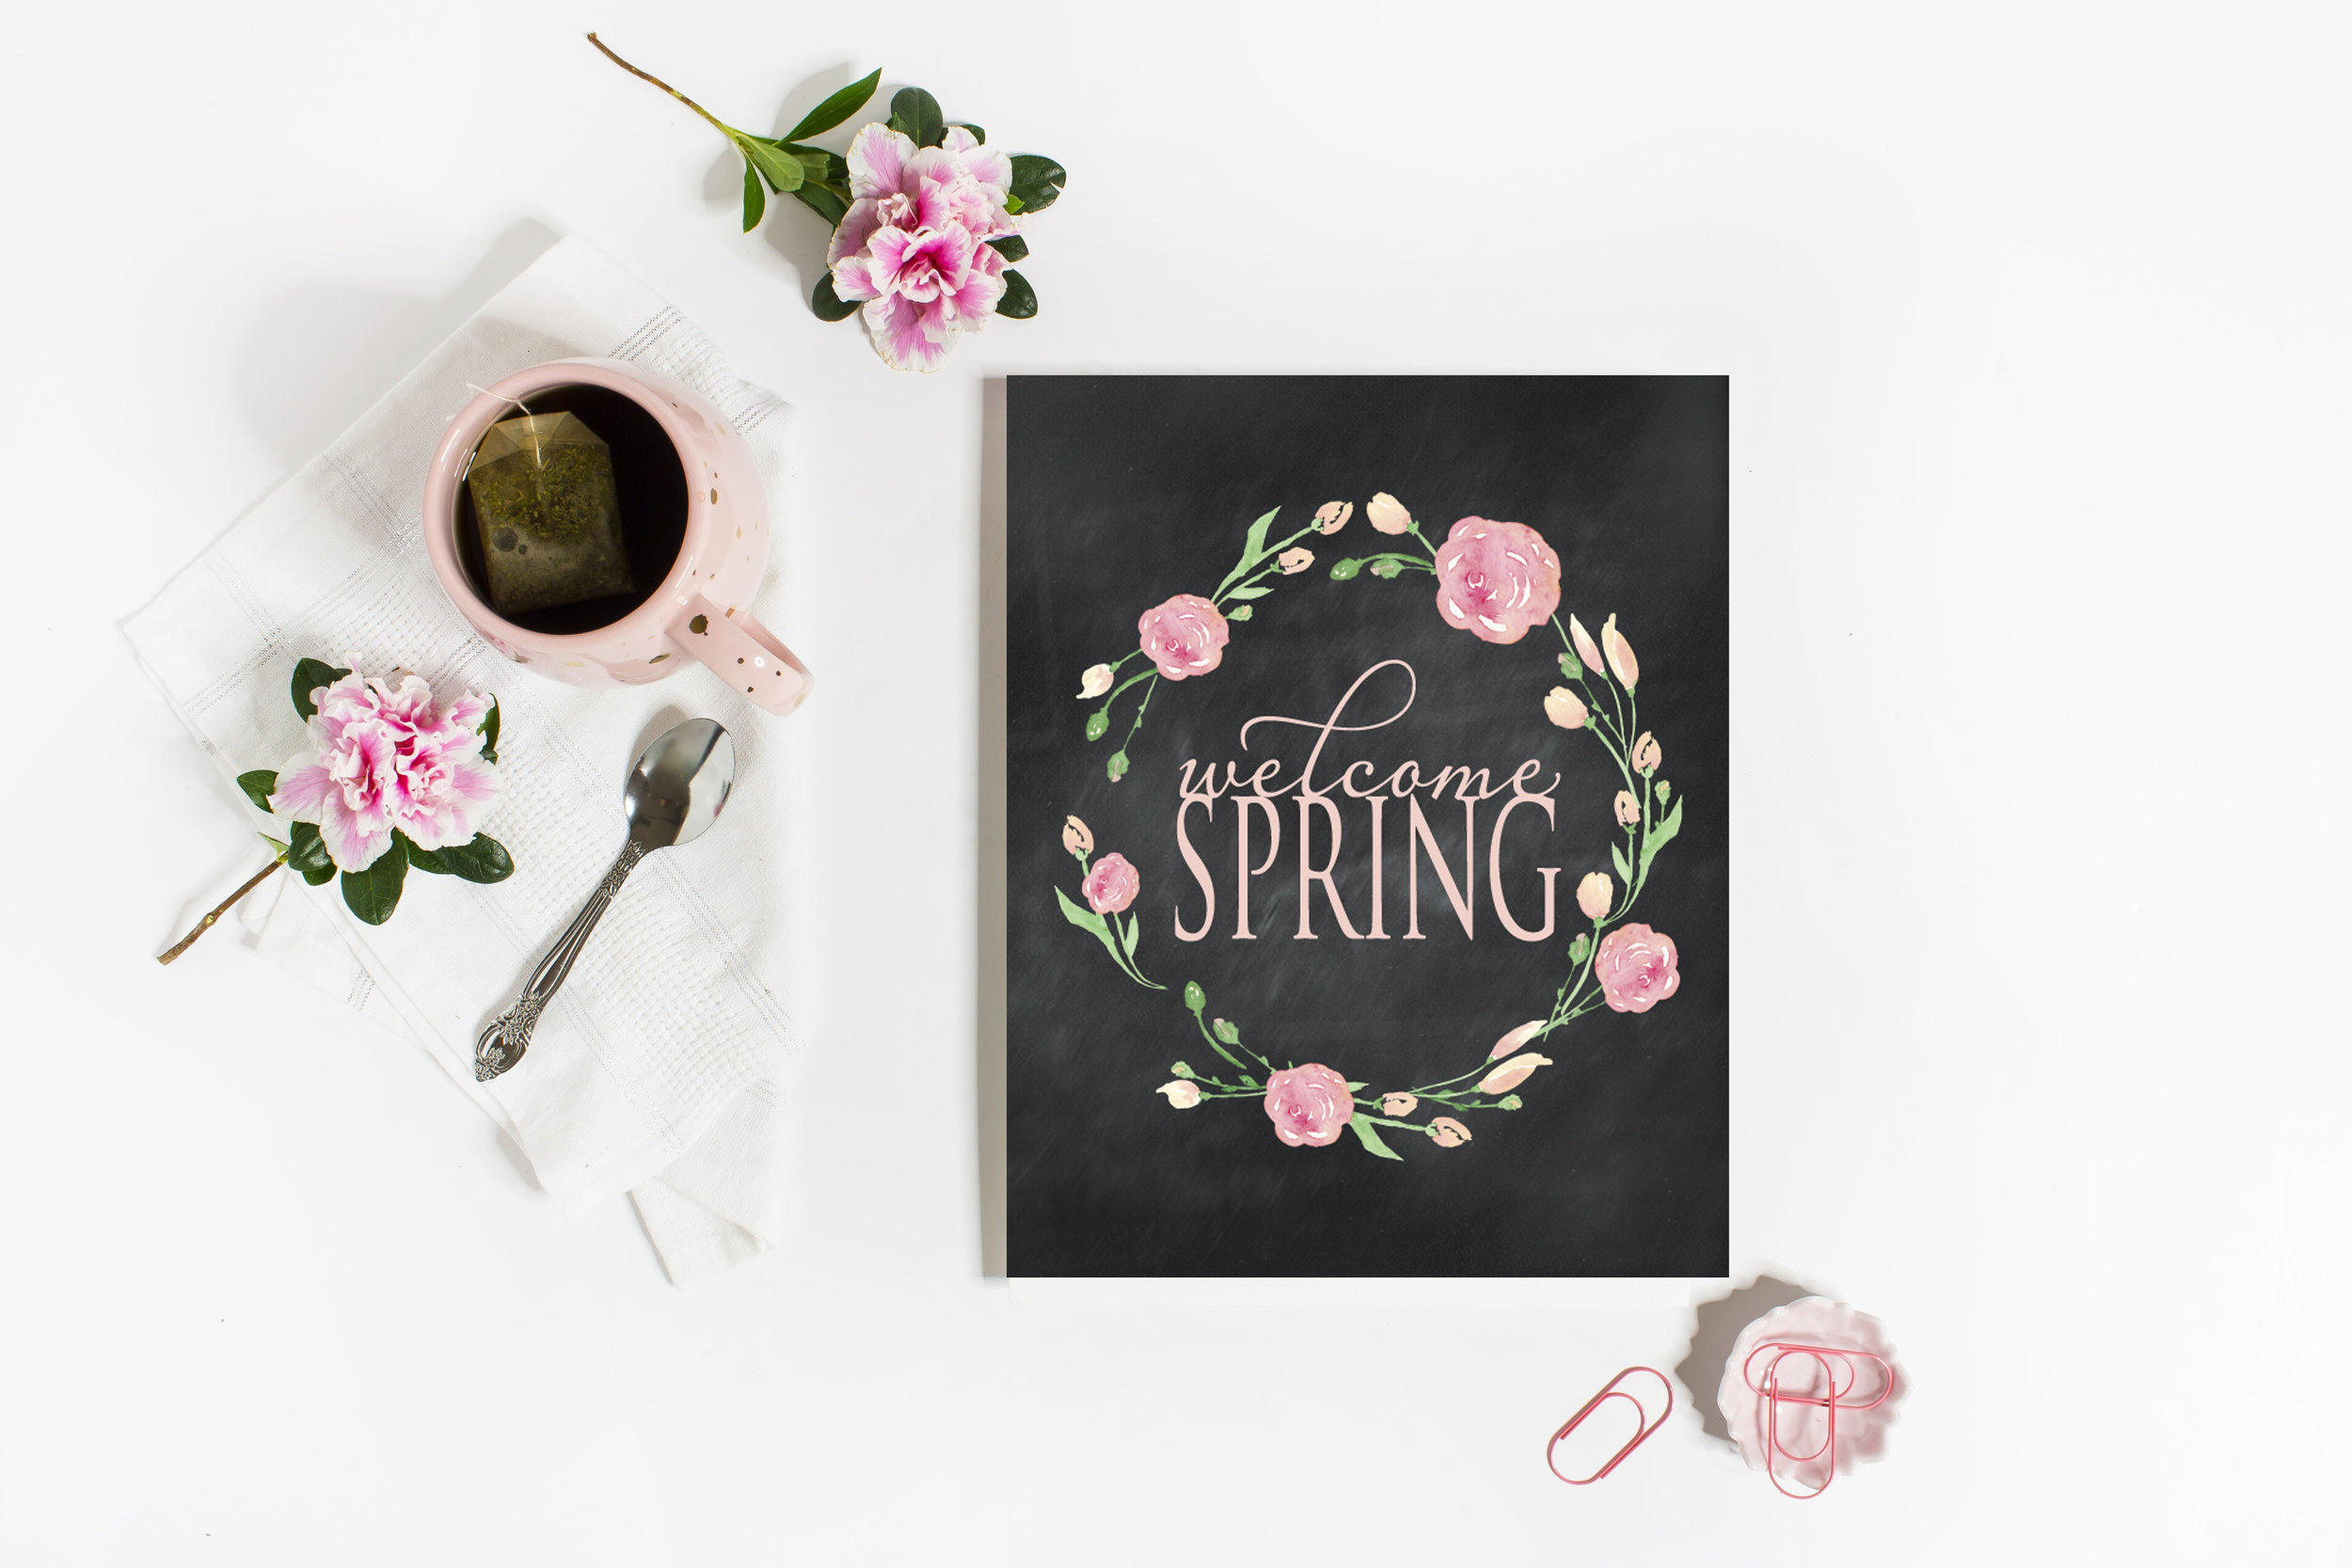 welcom spring.jpg